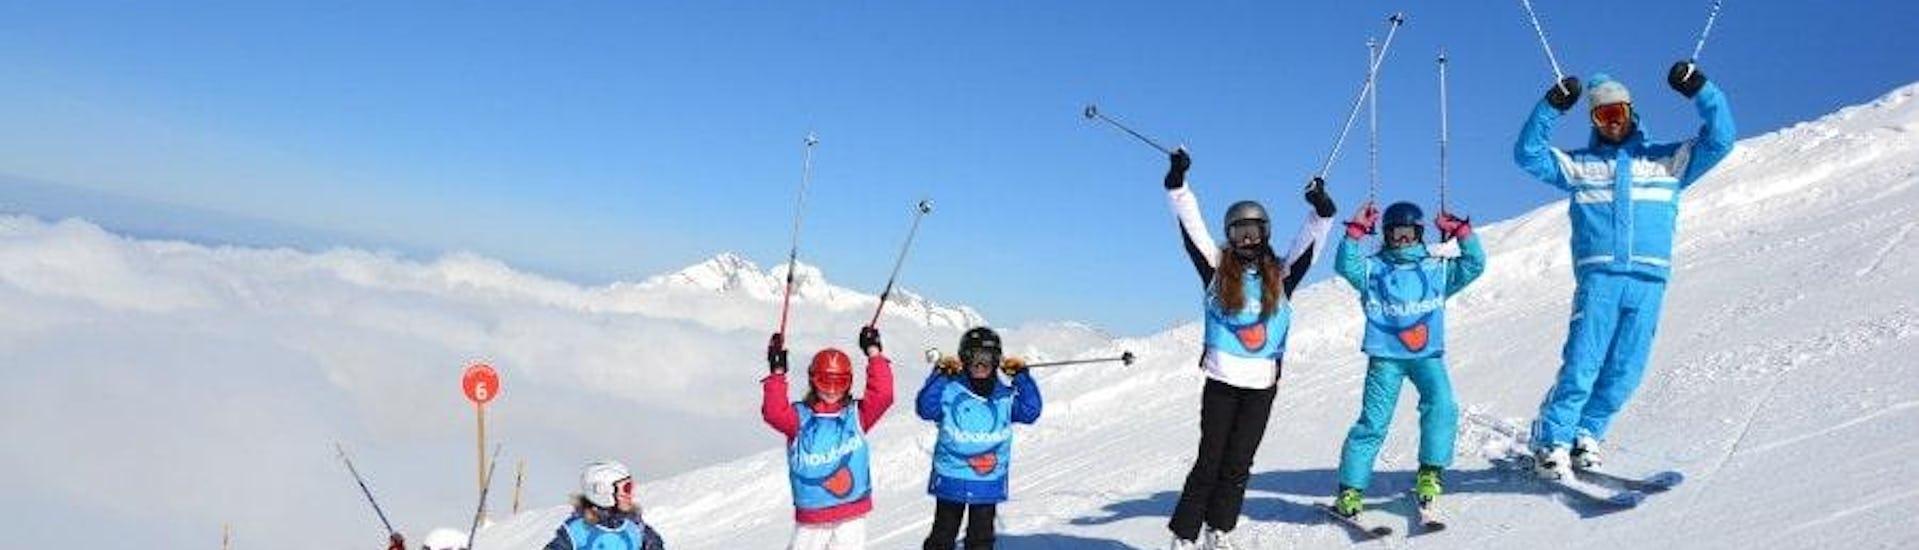 Ski Lessons for Kids (7-14 years) - Low Season